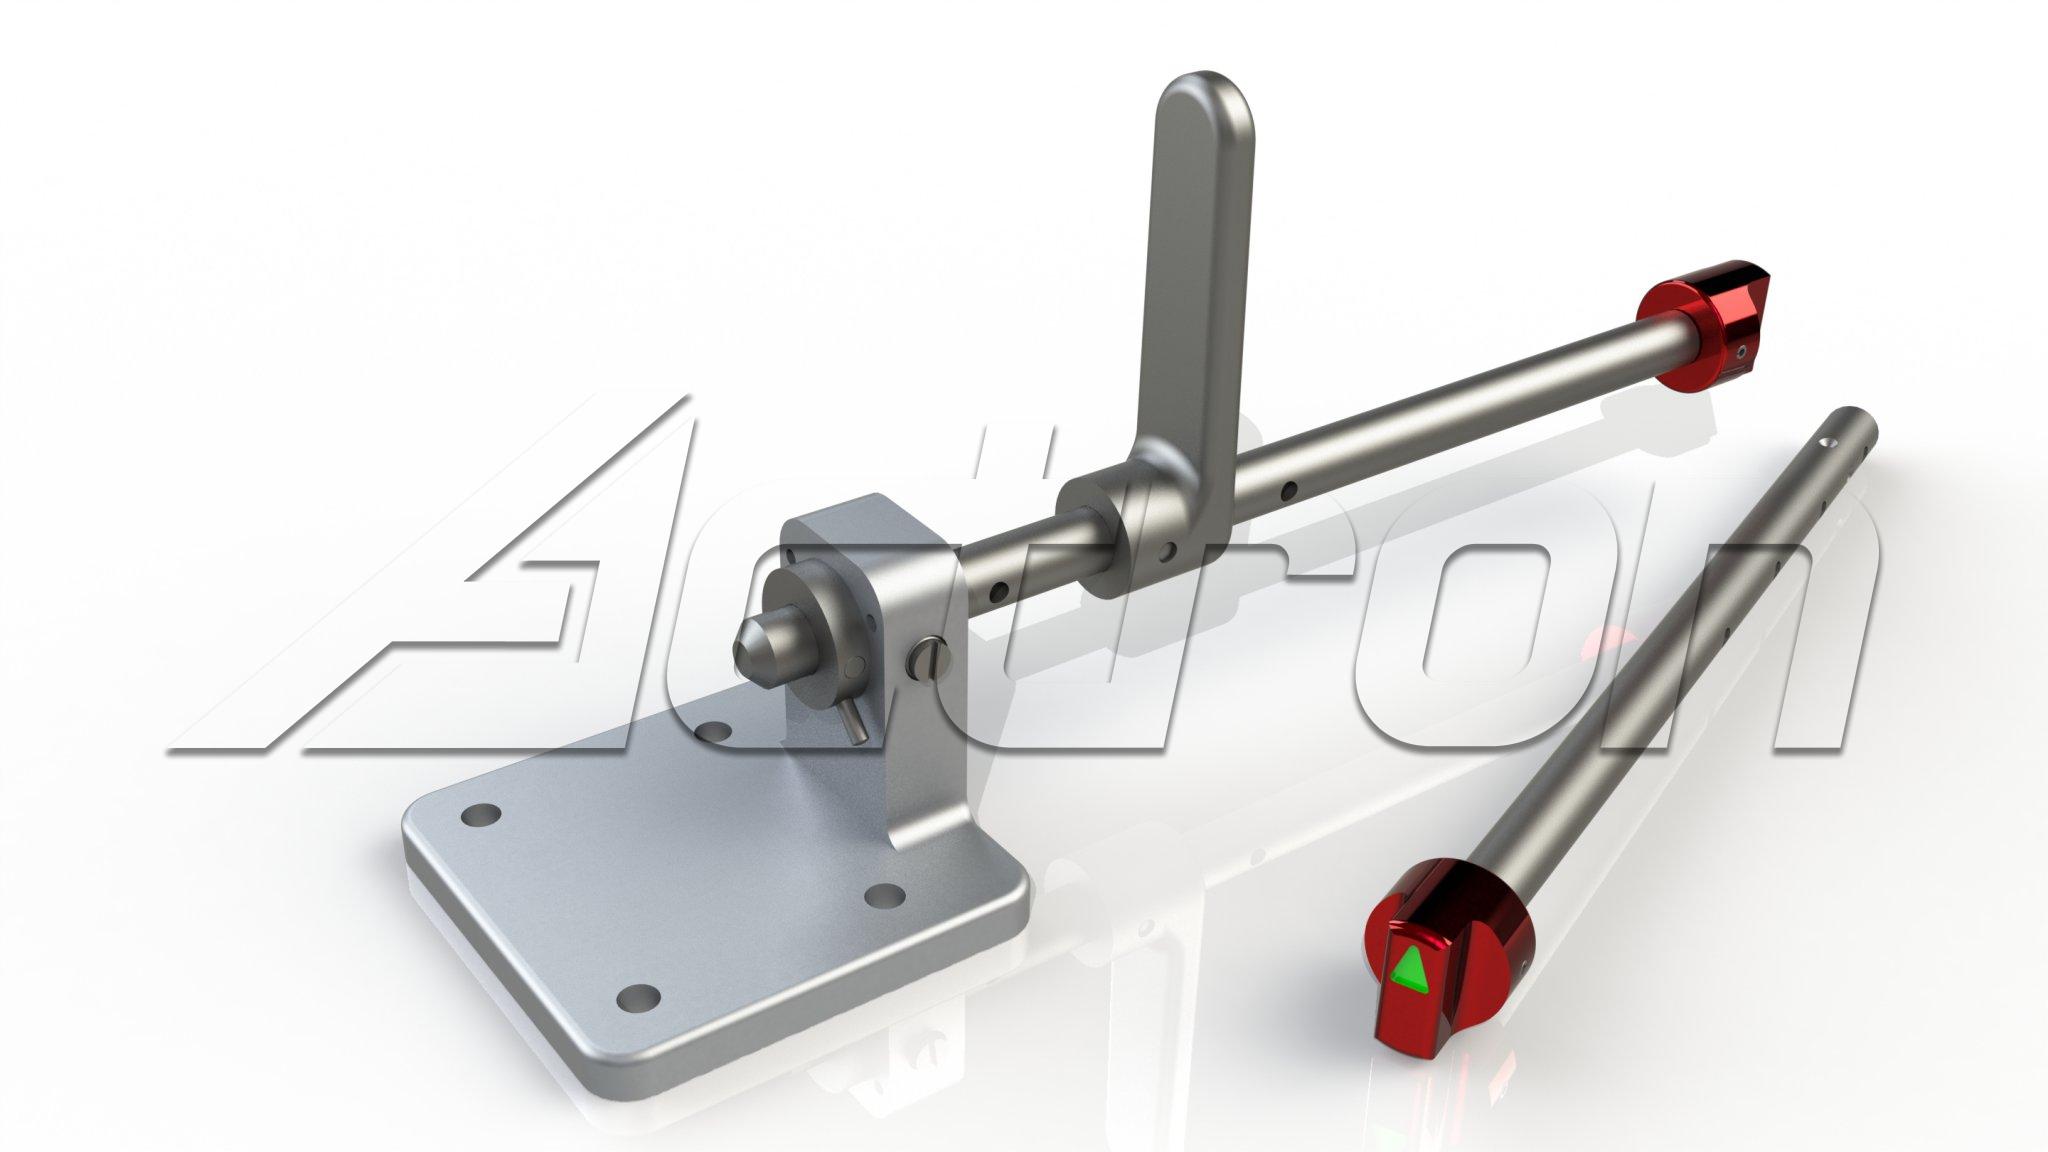 remote-retainer-8211-1-4-turn-4688-a35649.jpg